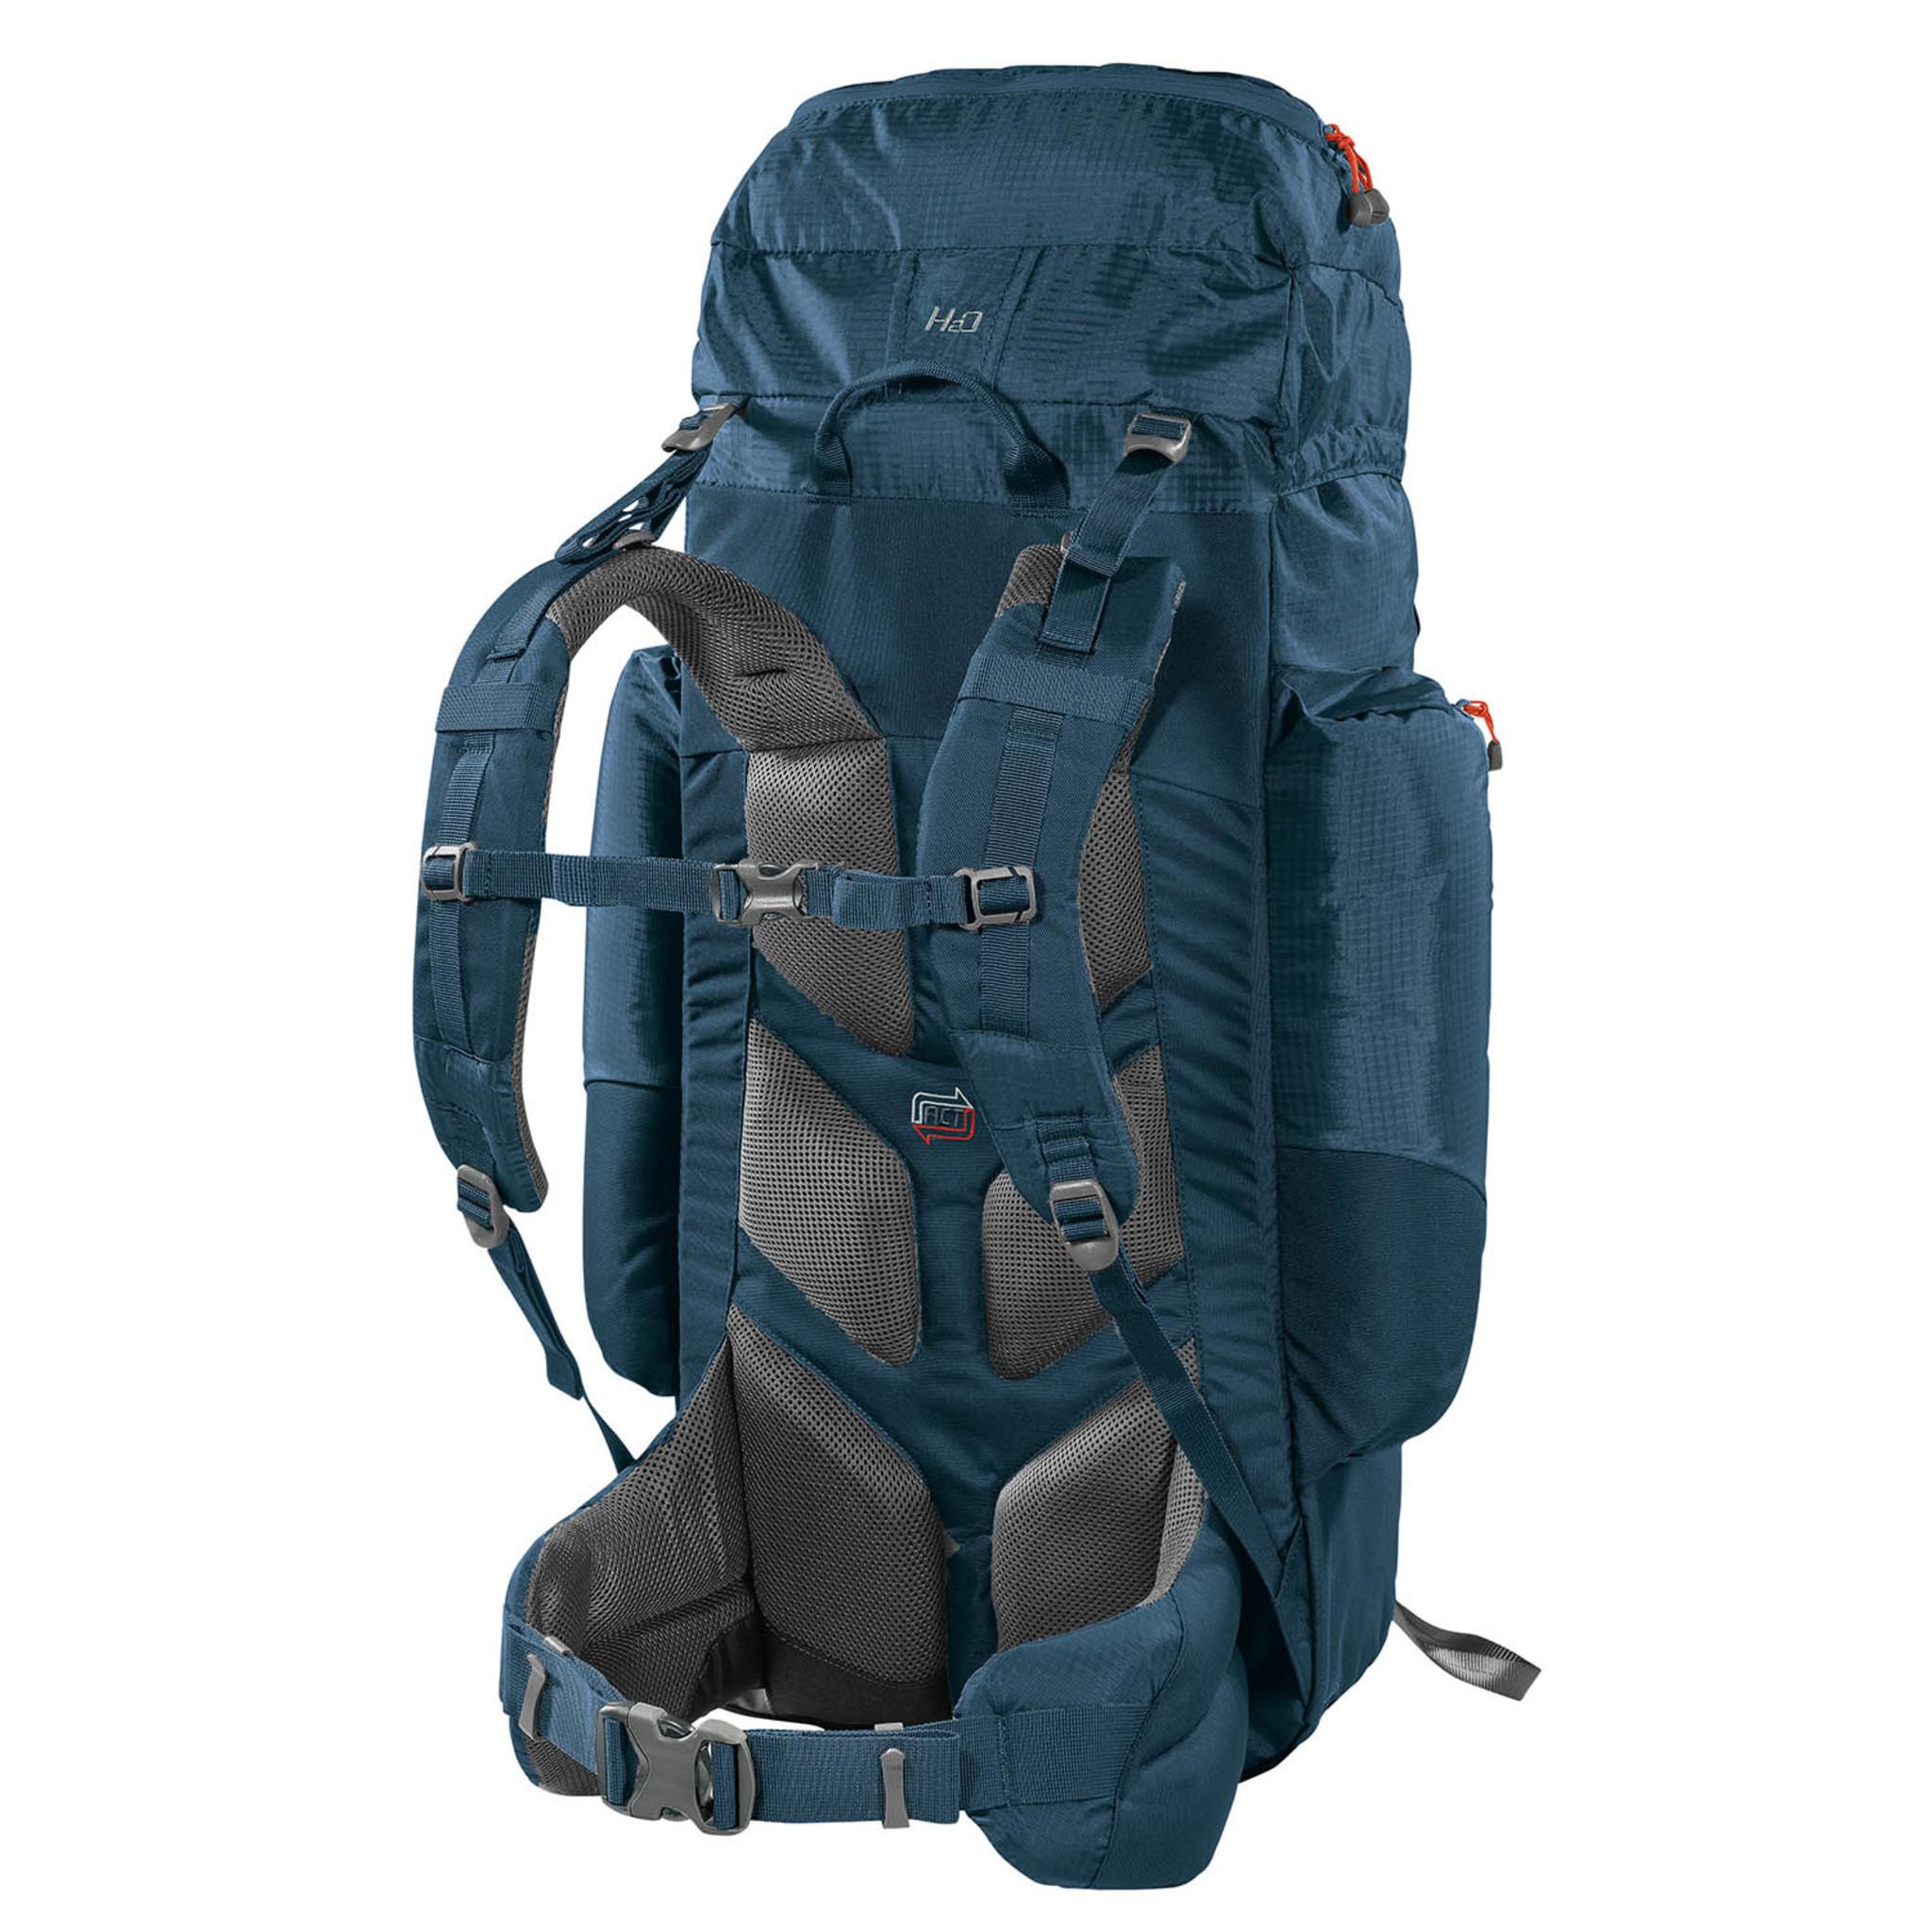 Ferrino Backpack Front Loader Rugzak Chilkoot 90 Liter Blauw 88x48x35 cm